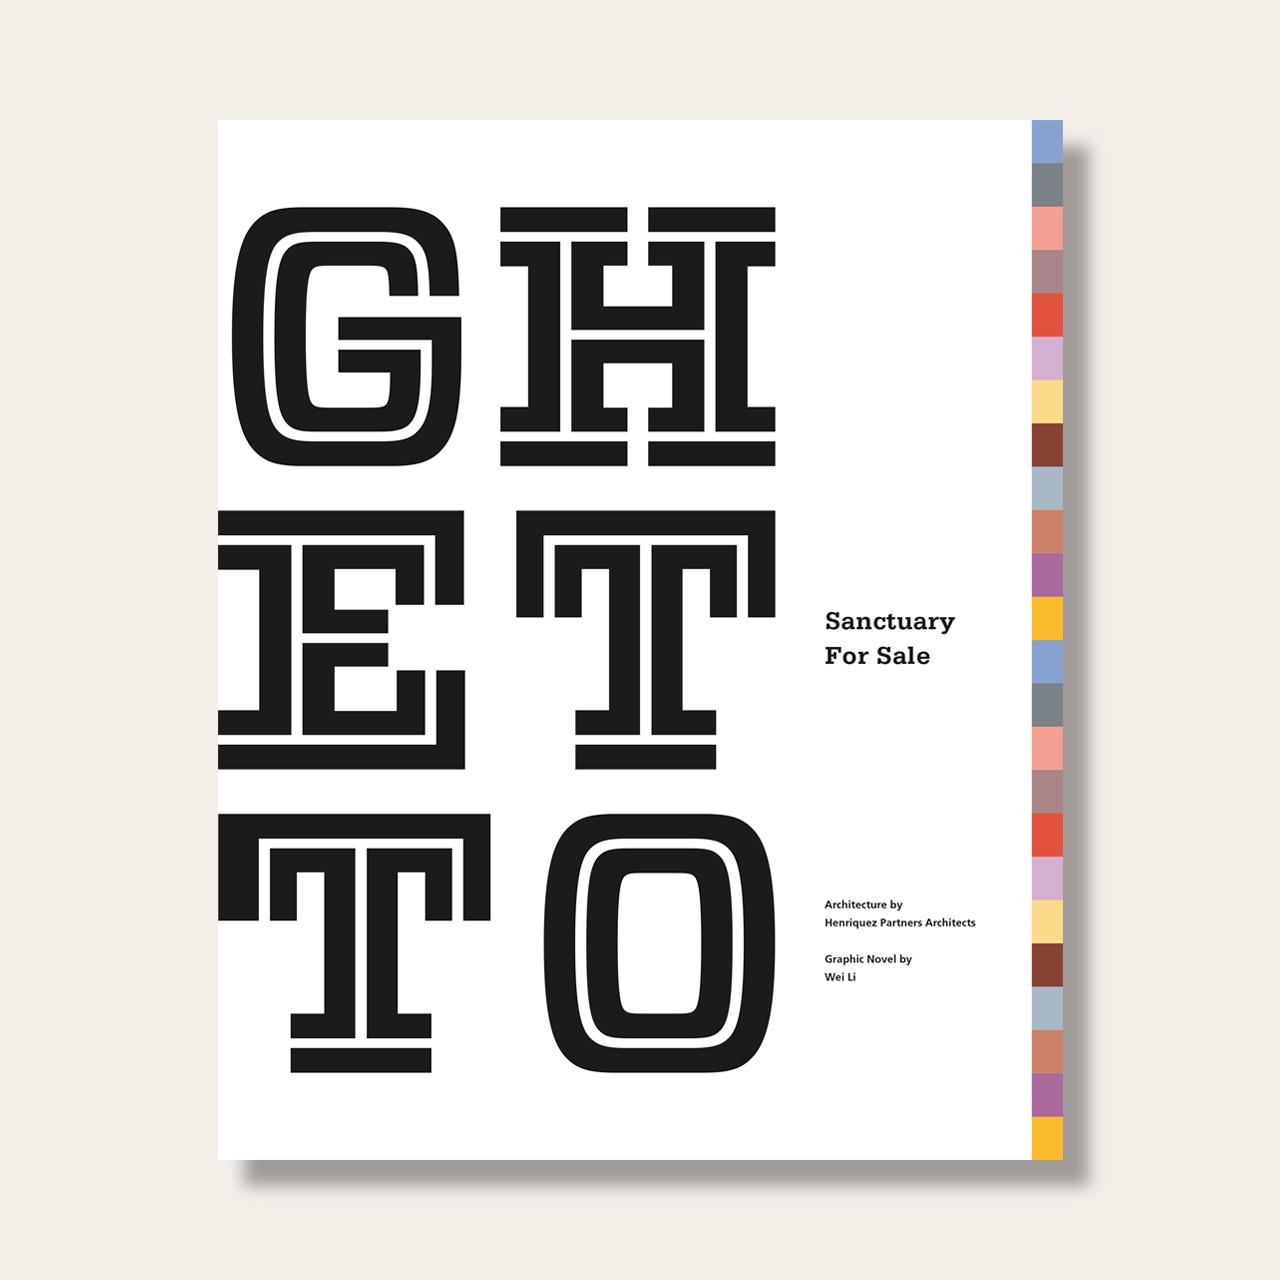 Cover of Henriquez Partner's GHETTO